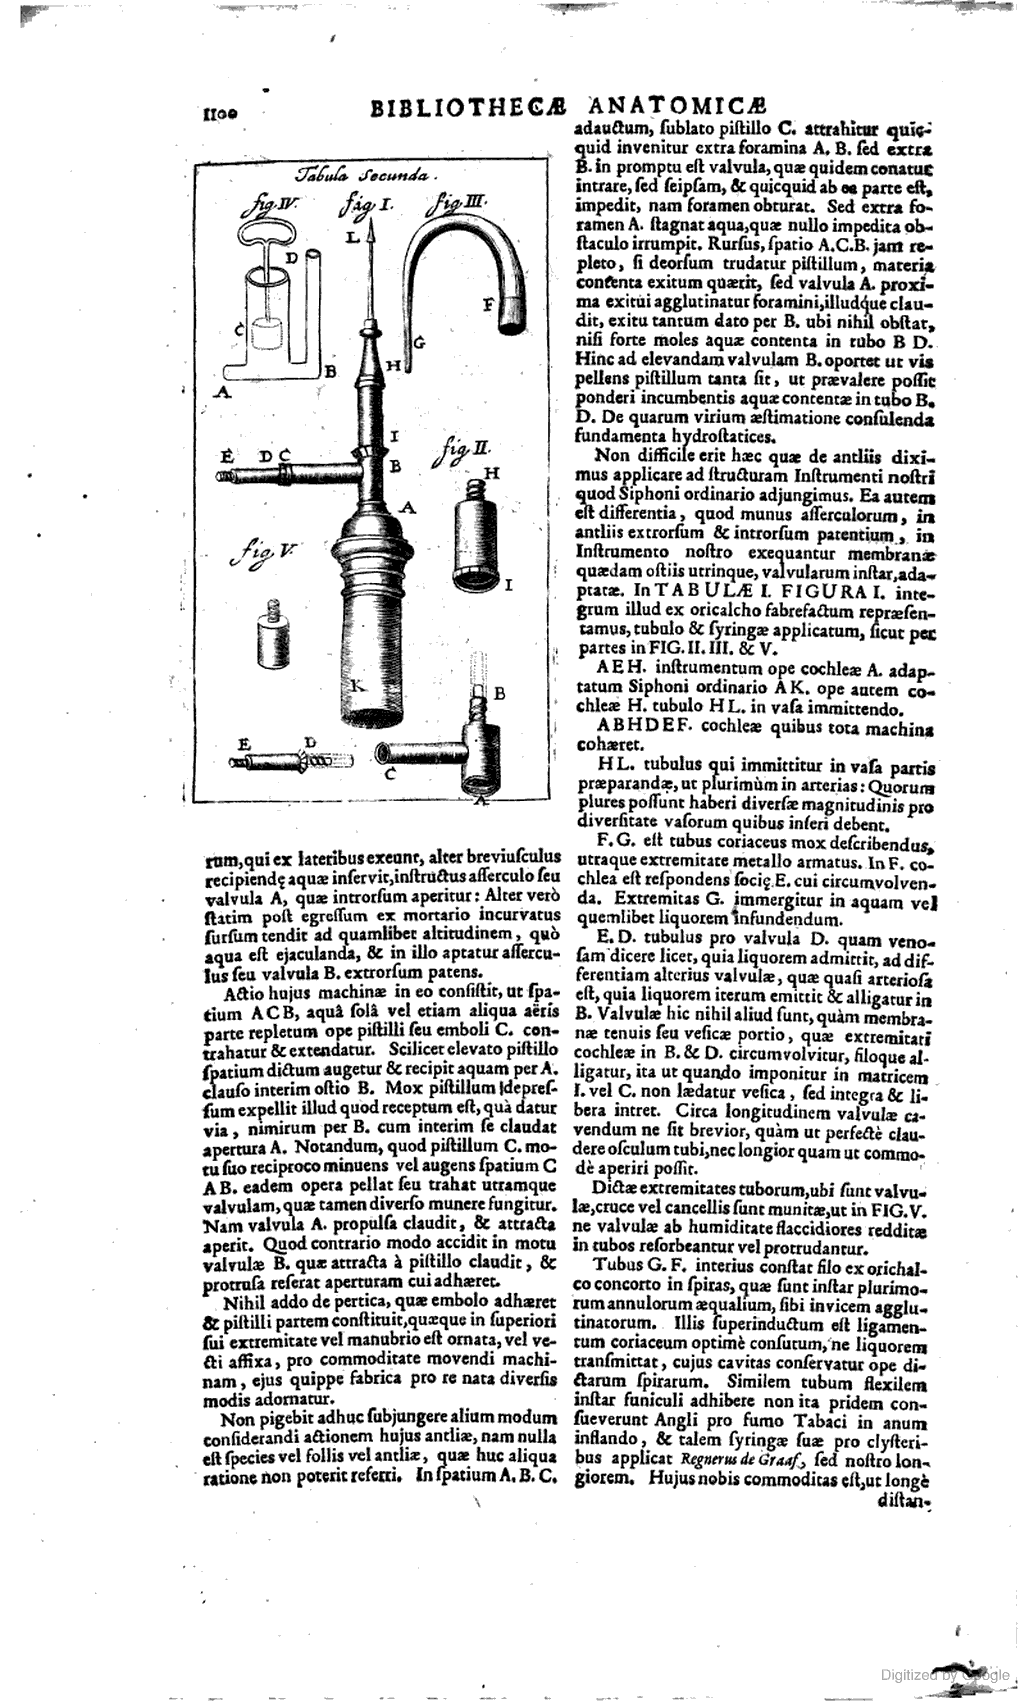 Bibliotheca anatomica, sive recens in anatomia inventorum thesaurus ...